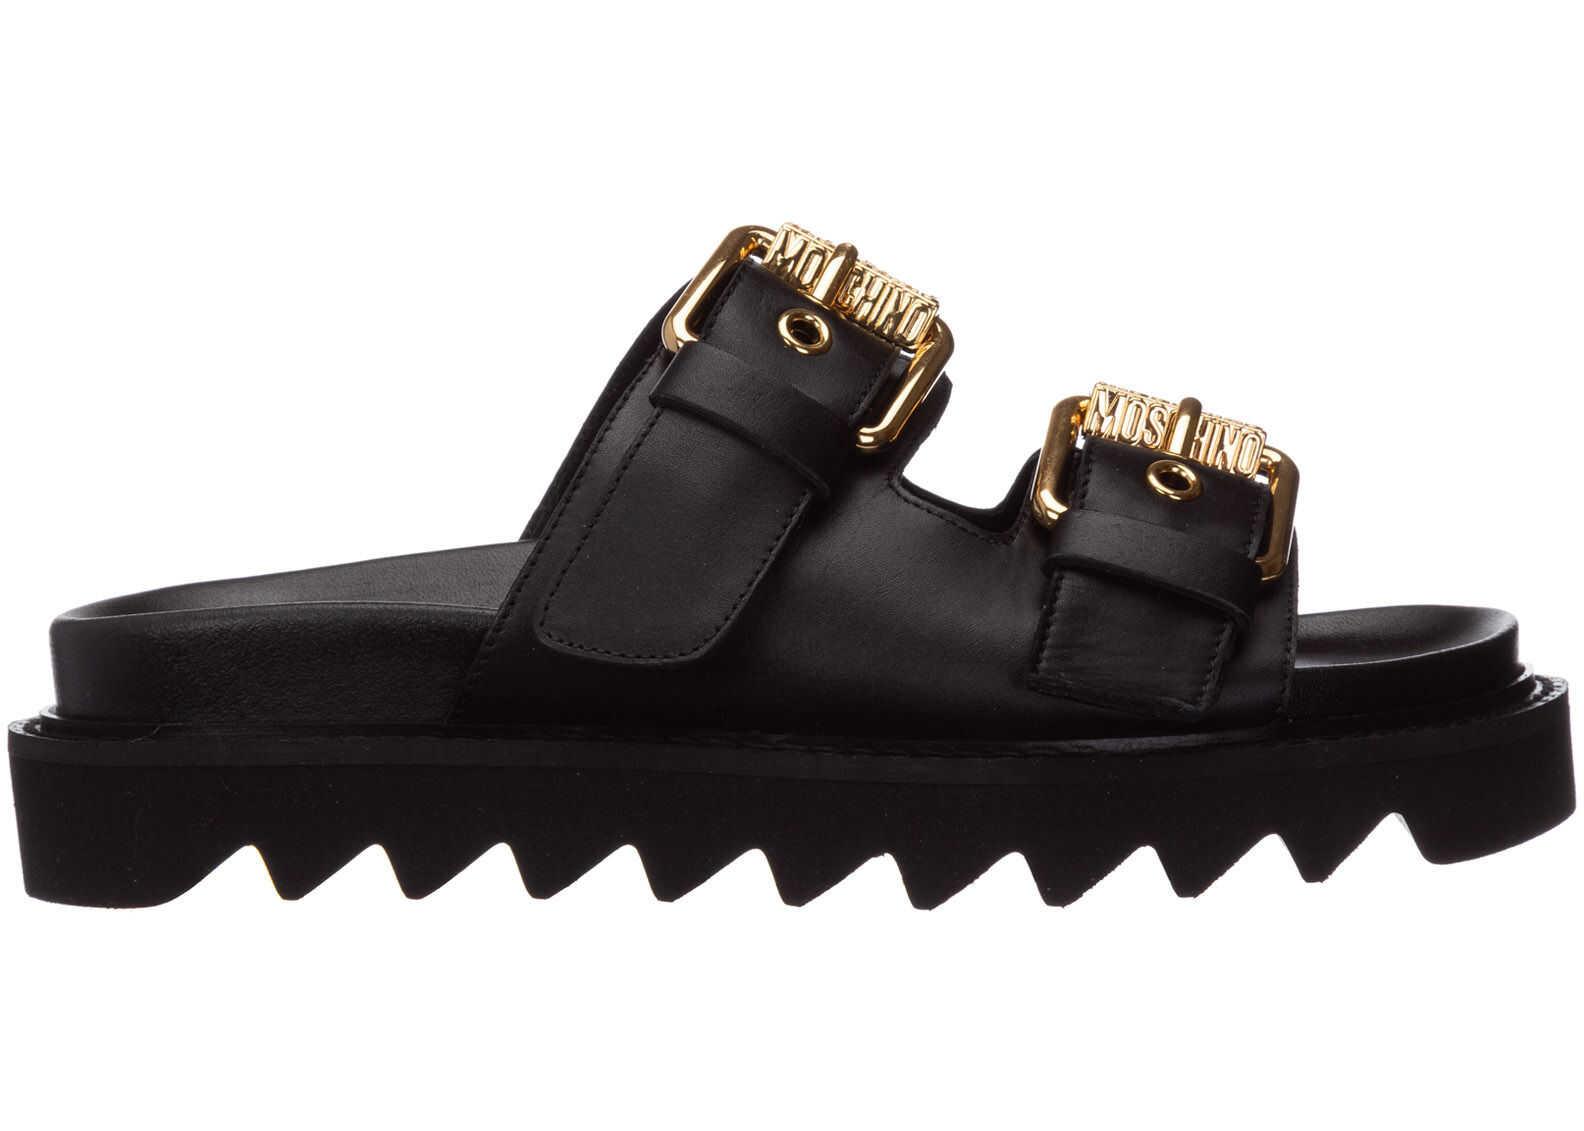 Moschino Slippers Sandals Black